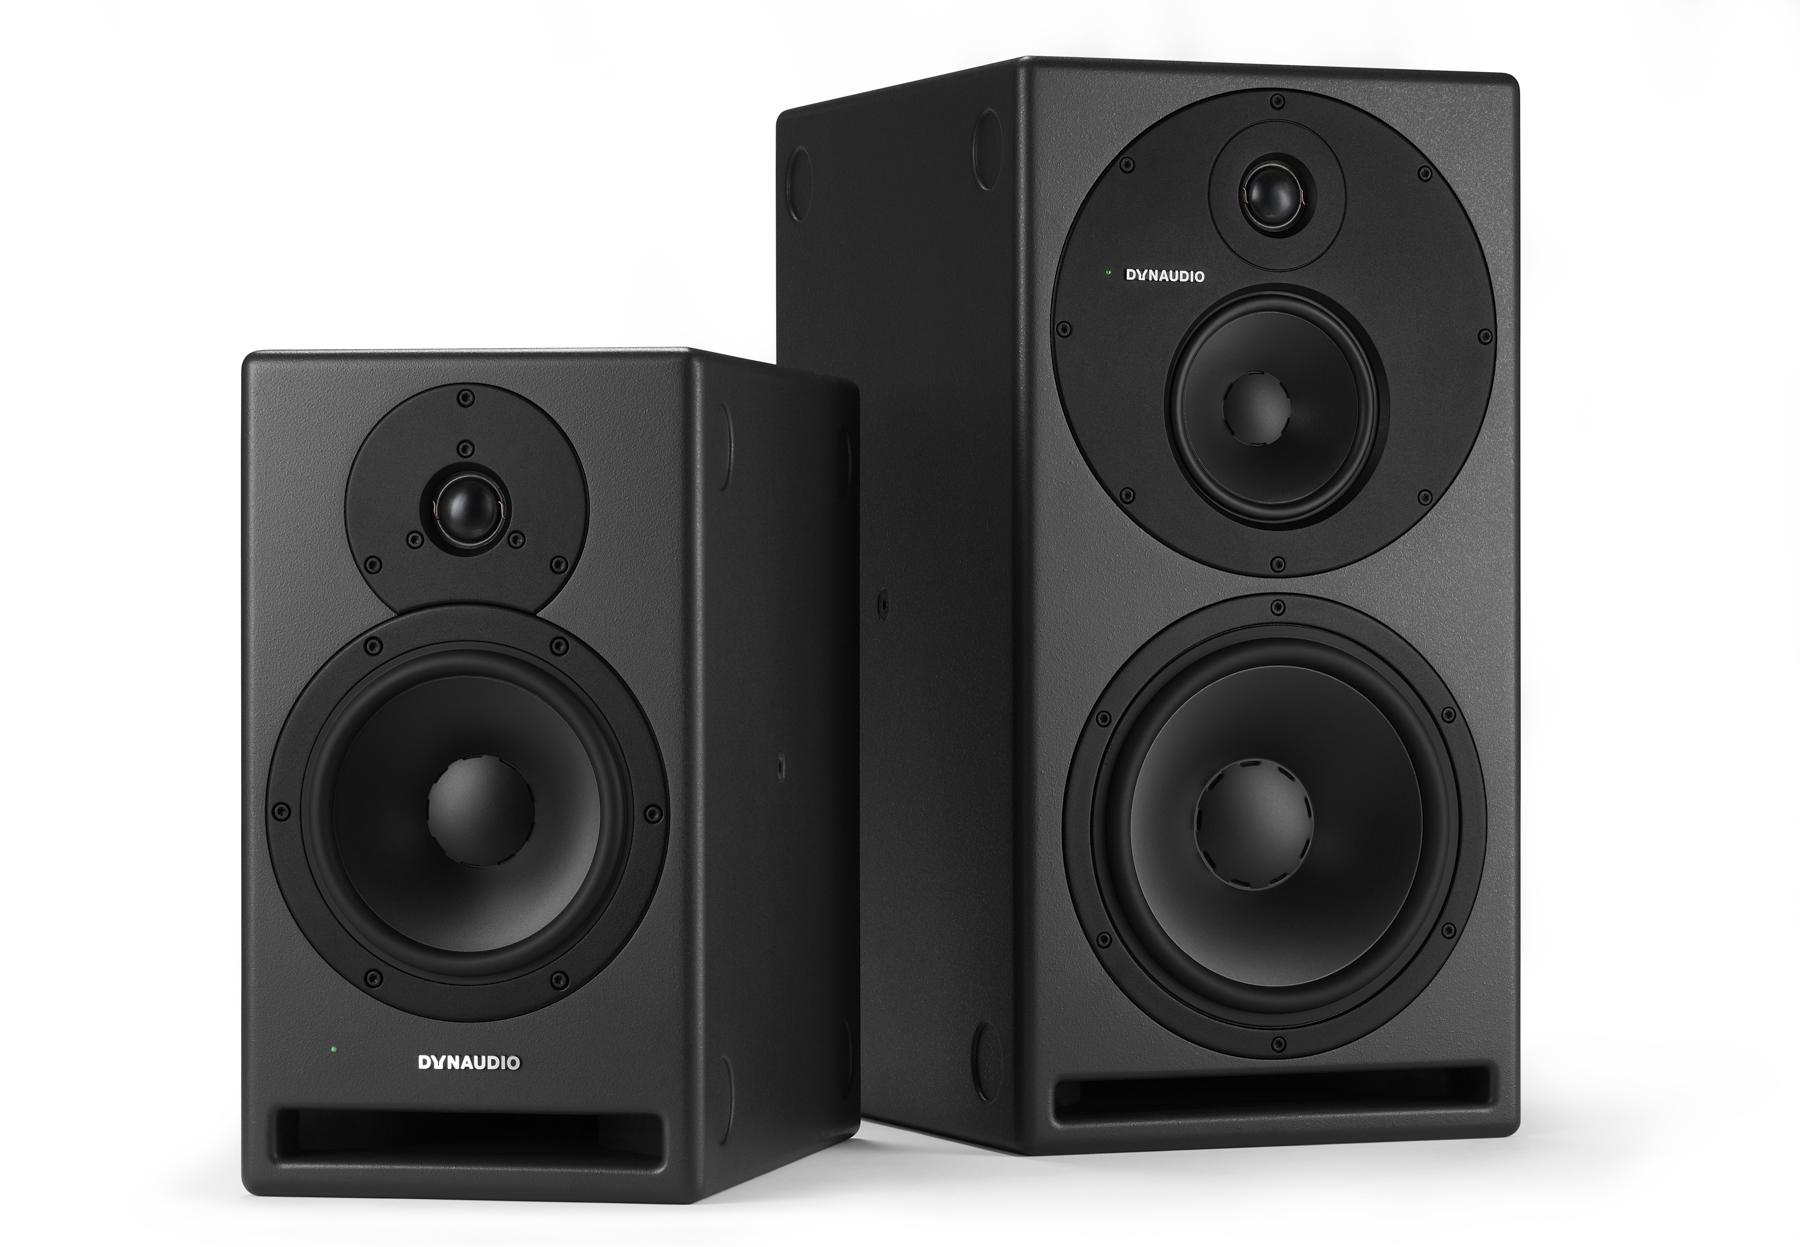 News: Dynaudio präsentiert Core Monitor-Serie